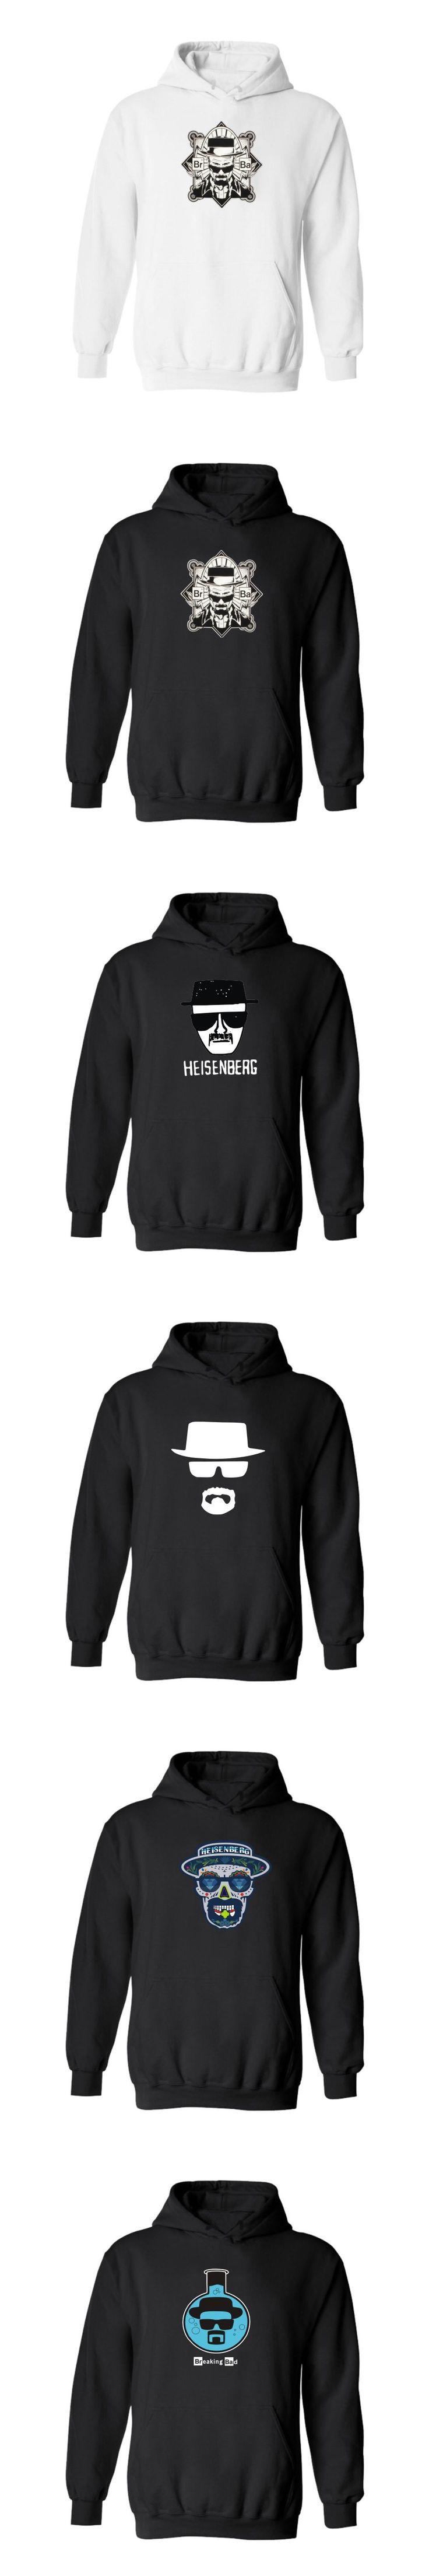 Chemical Heisenberg Hooded Sweatshirt Men Hoodies Fashion Hoodie Mens Hip Hop Fashion Autumn Hoodies Men Hip Hop Casual Clothes